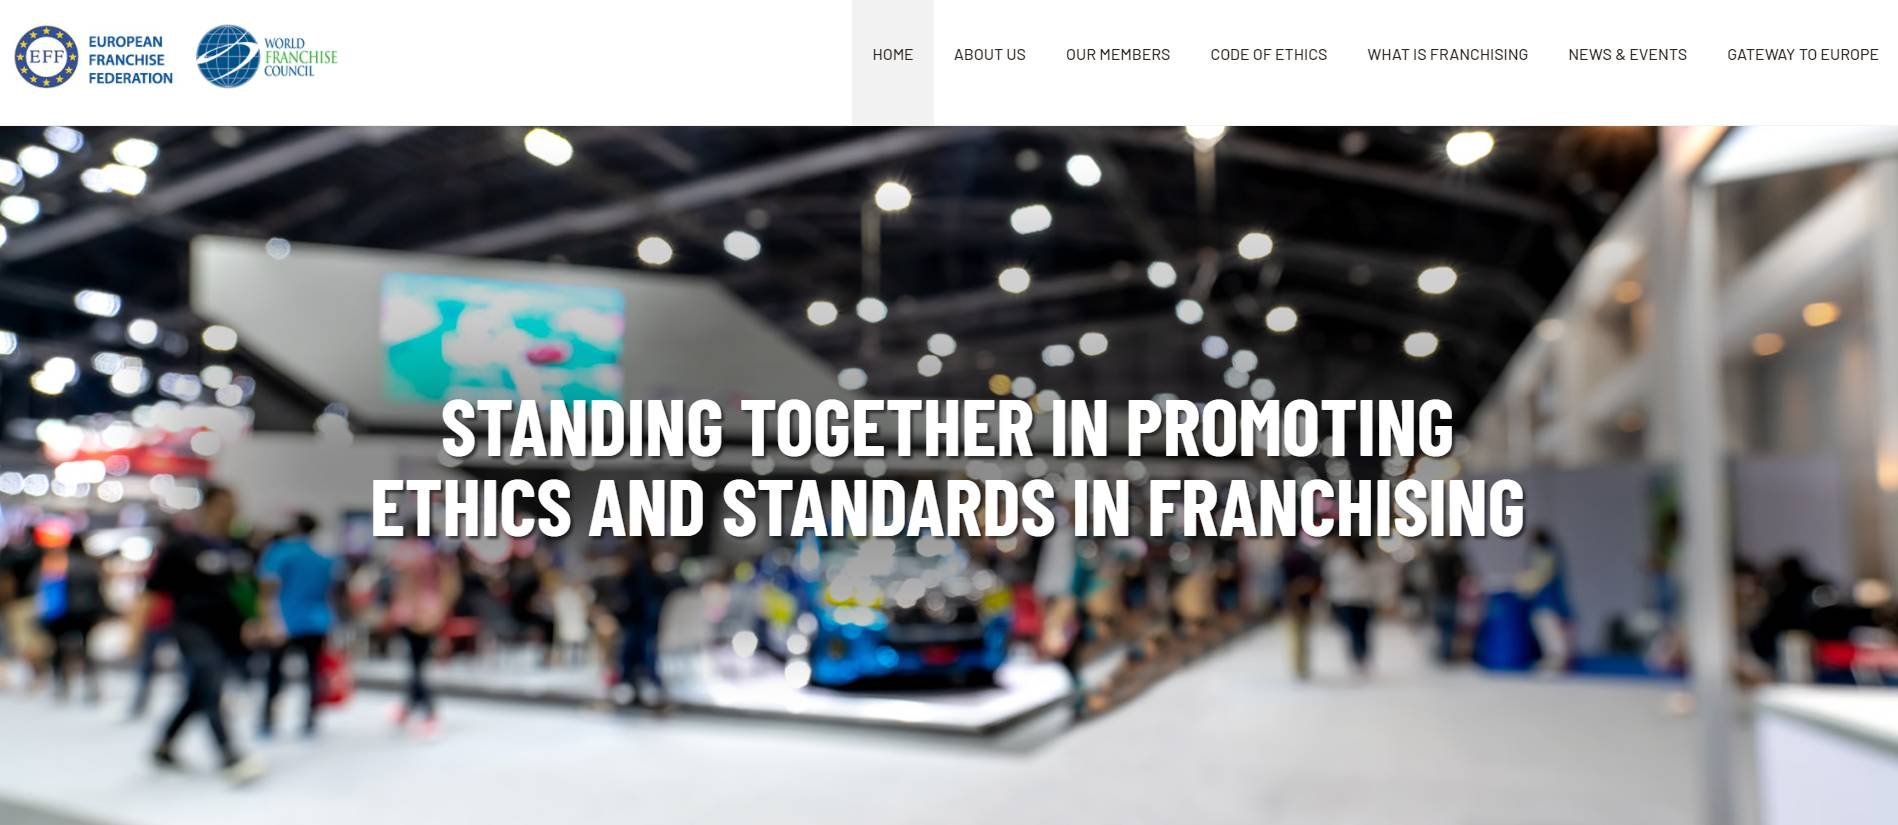 European Franchise Federation (1)